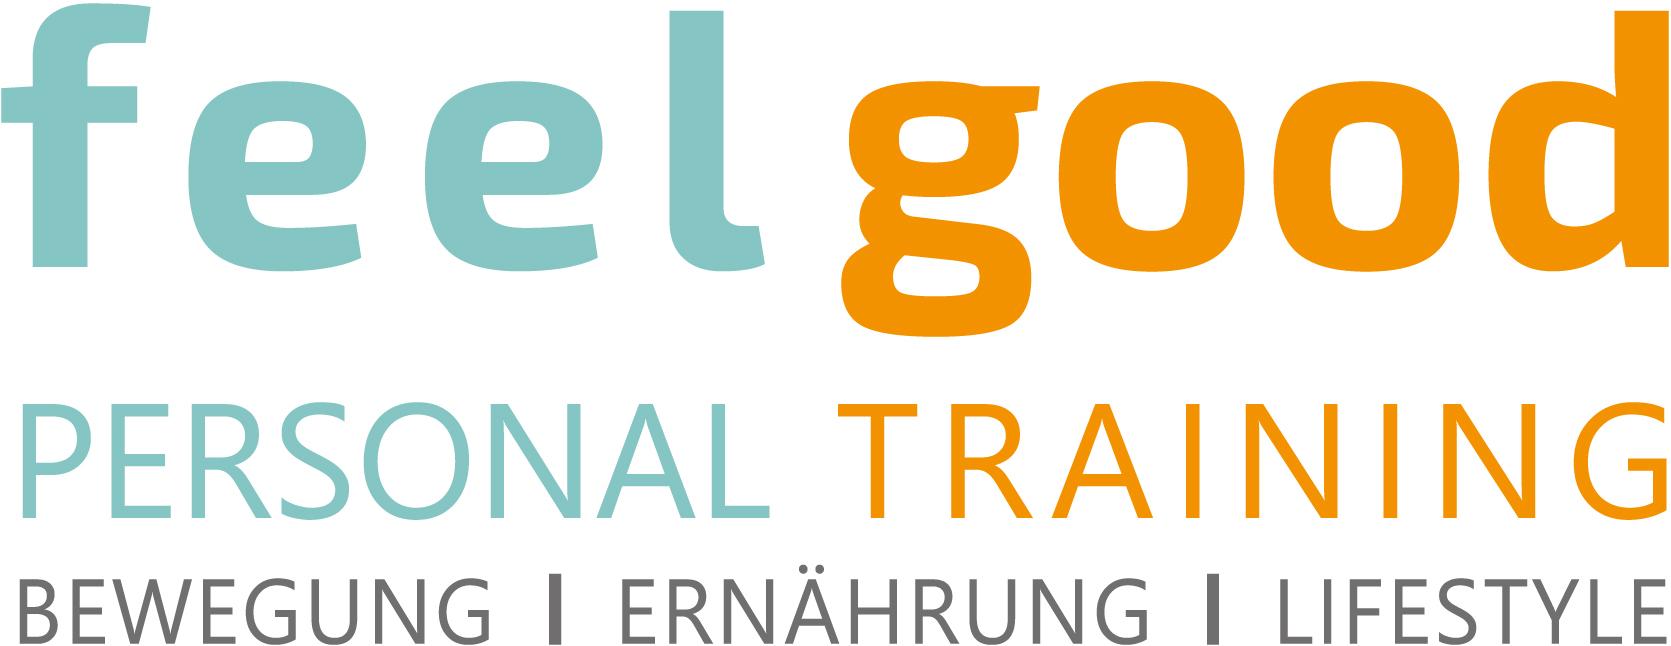 feelGOOD Education